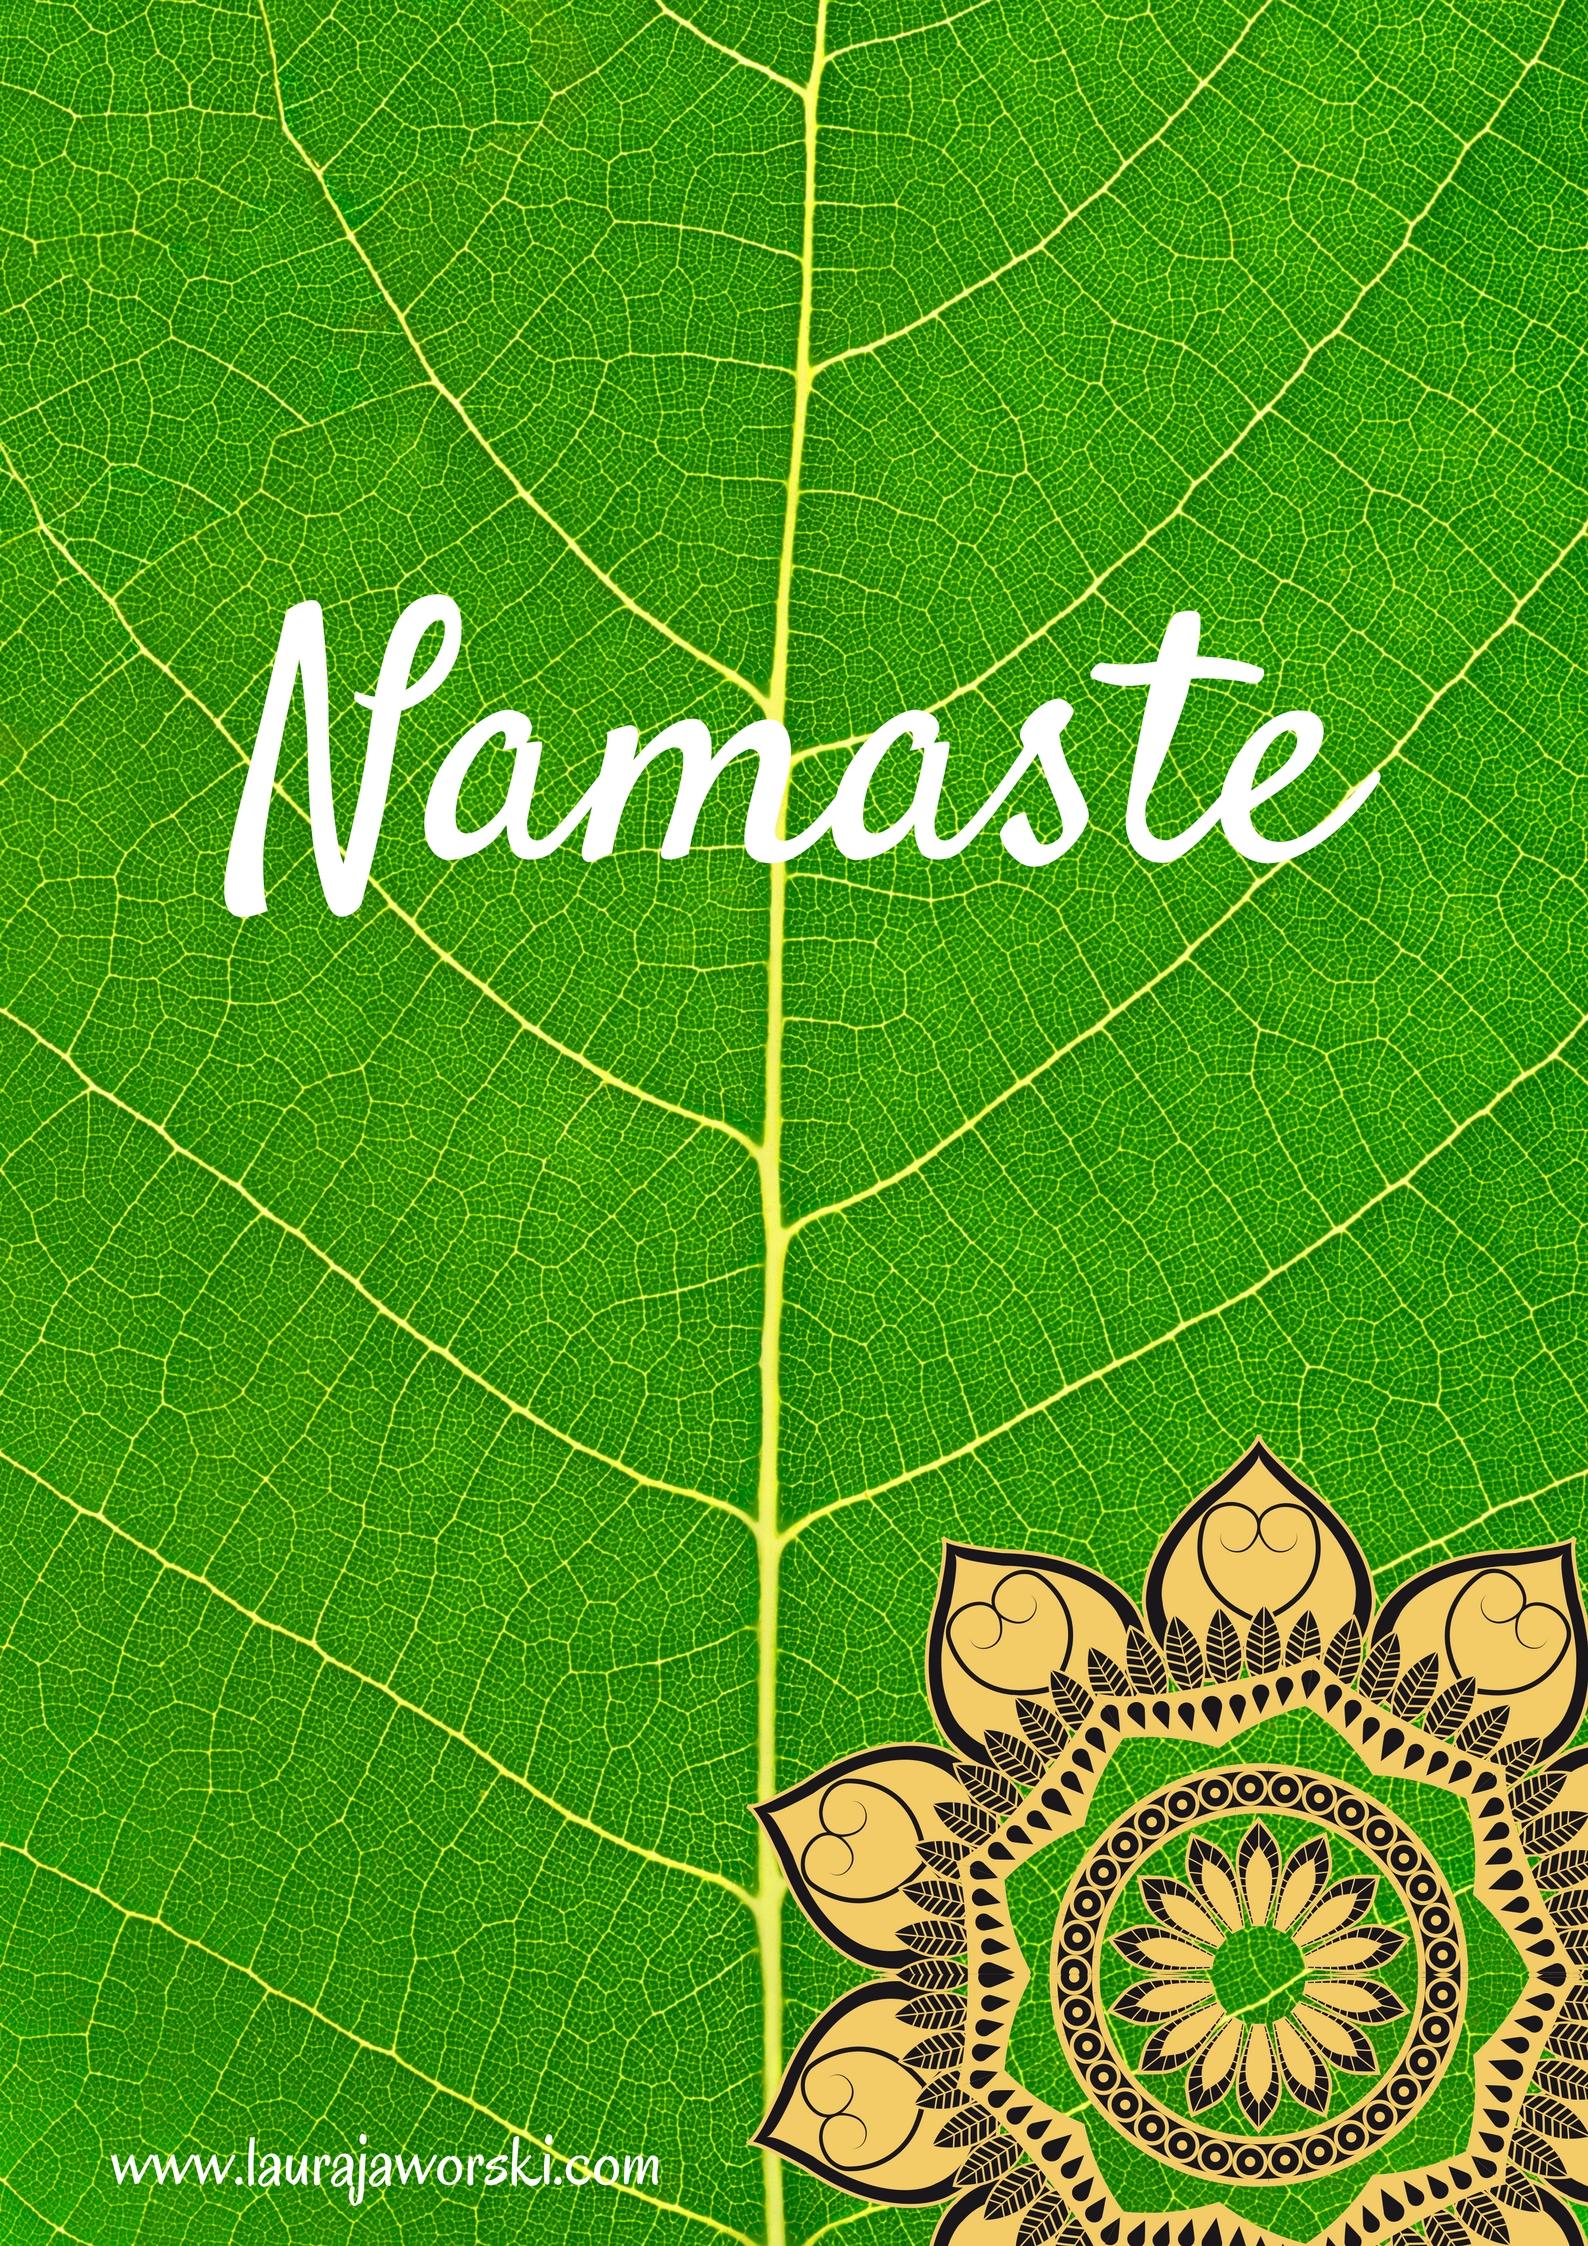 Namaste | www.laurajaworski.com